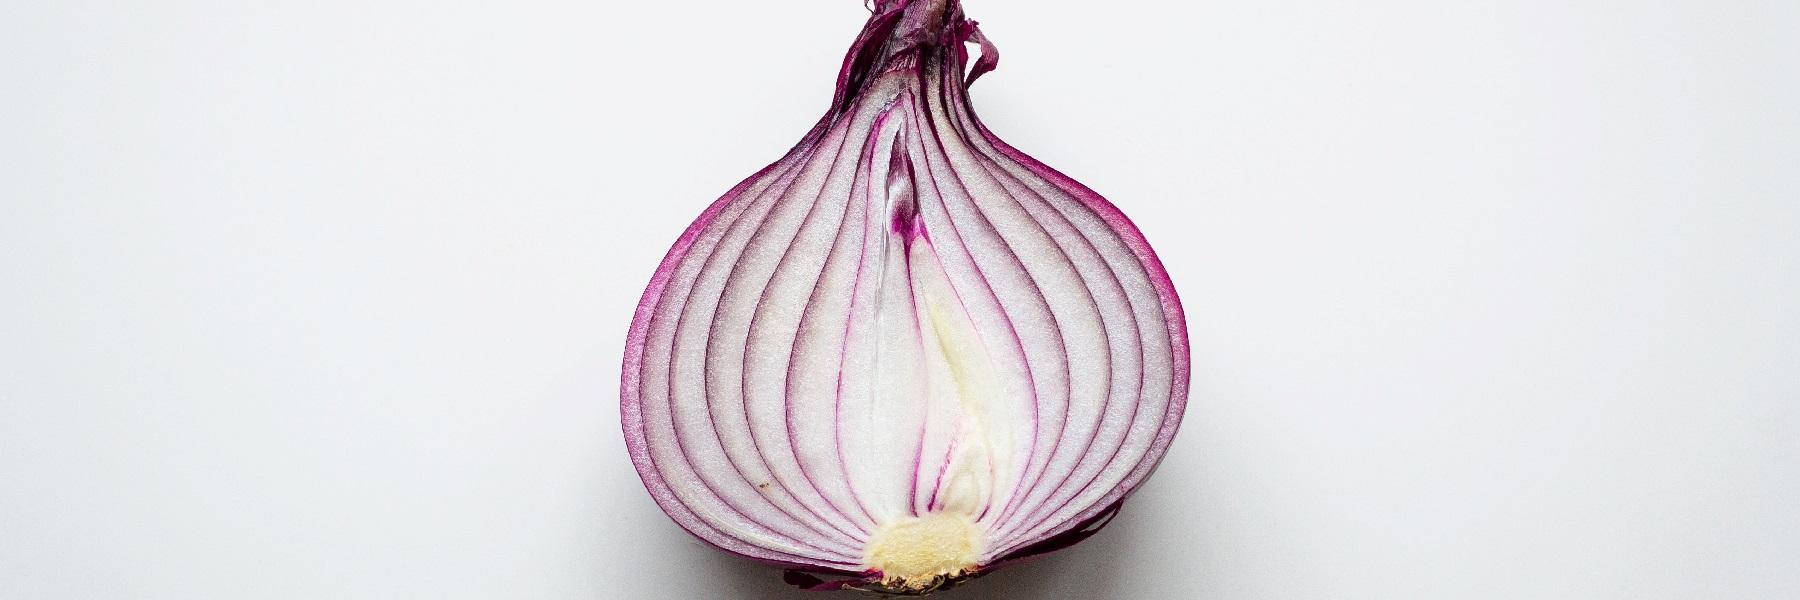 red onion slider image